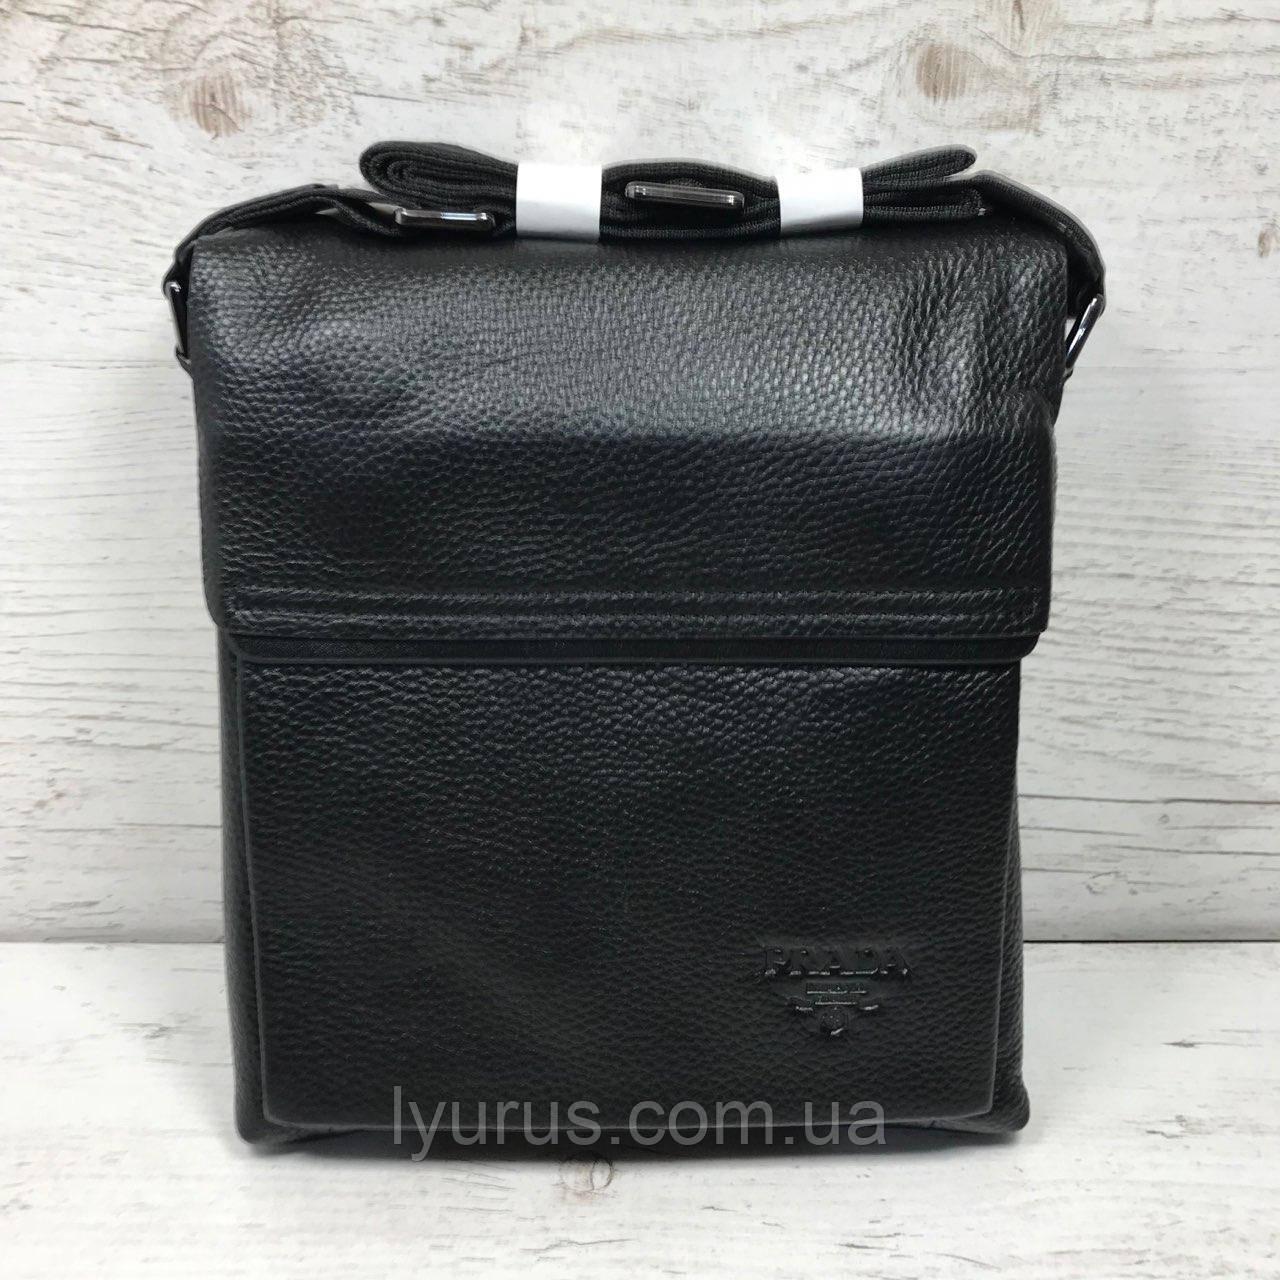 Мужская кожаная сумка мессенджер  Prada